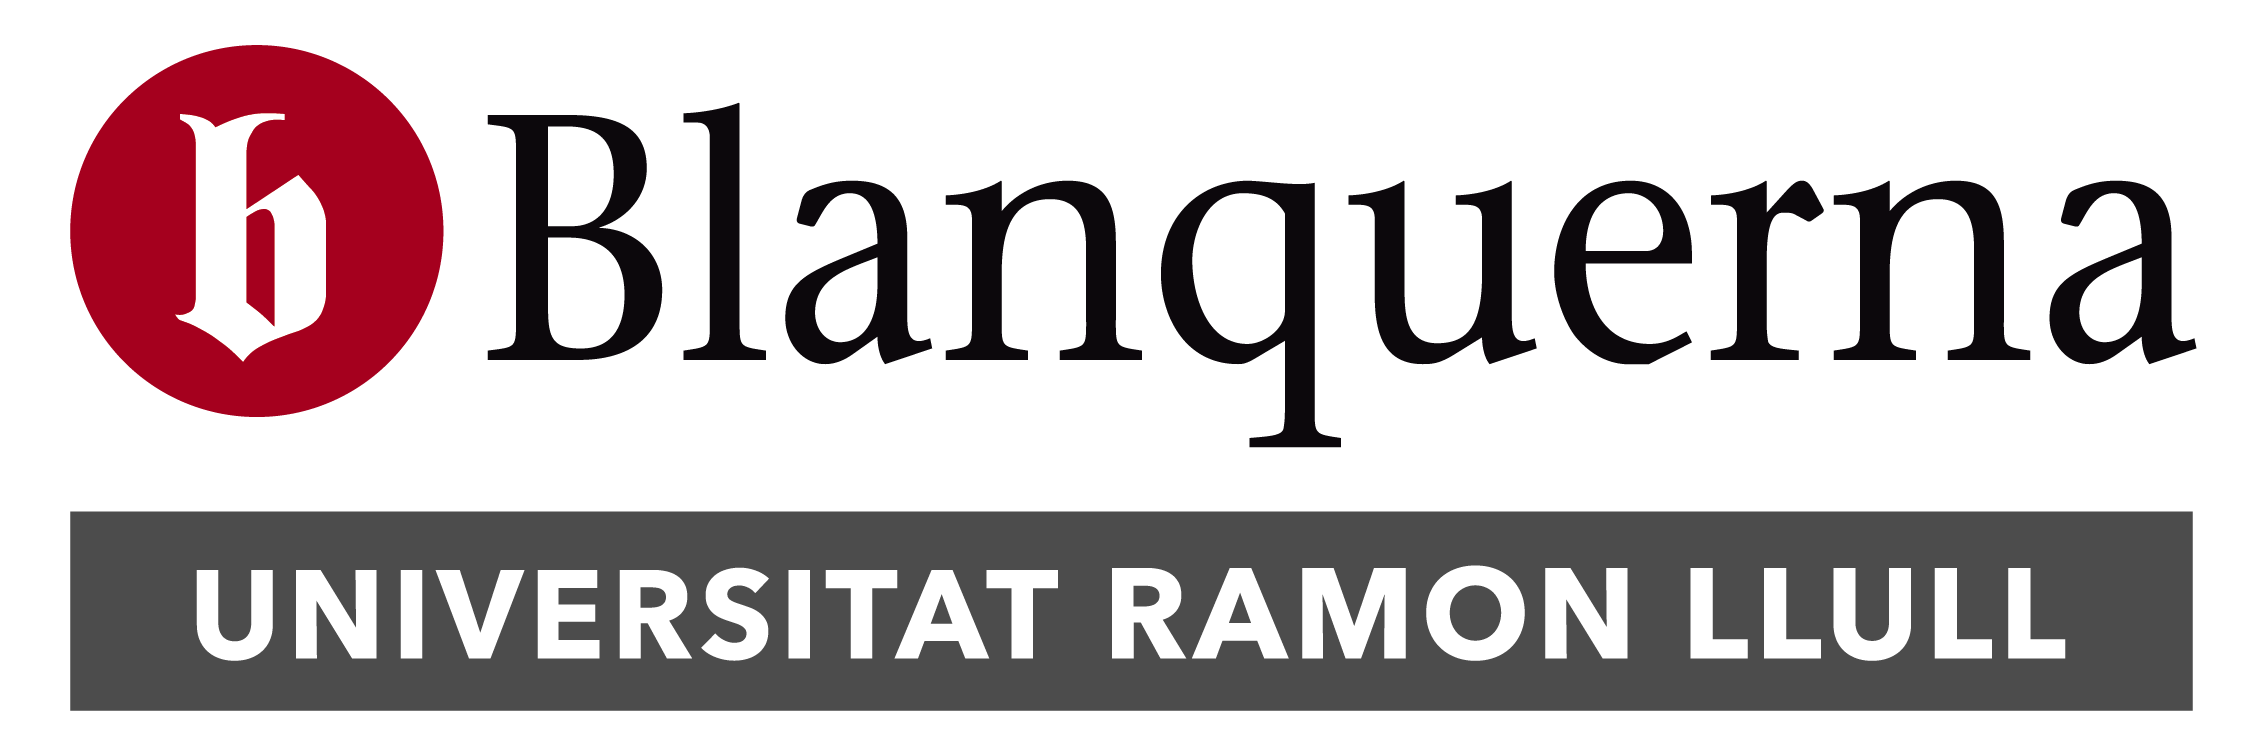 Blanquerna Universitat Ramon Llull